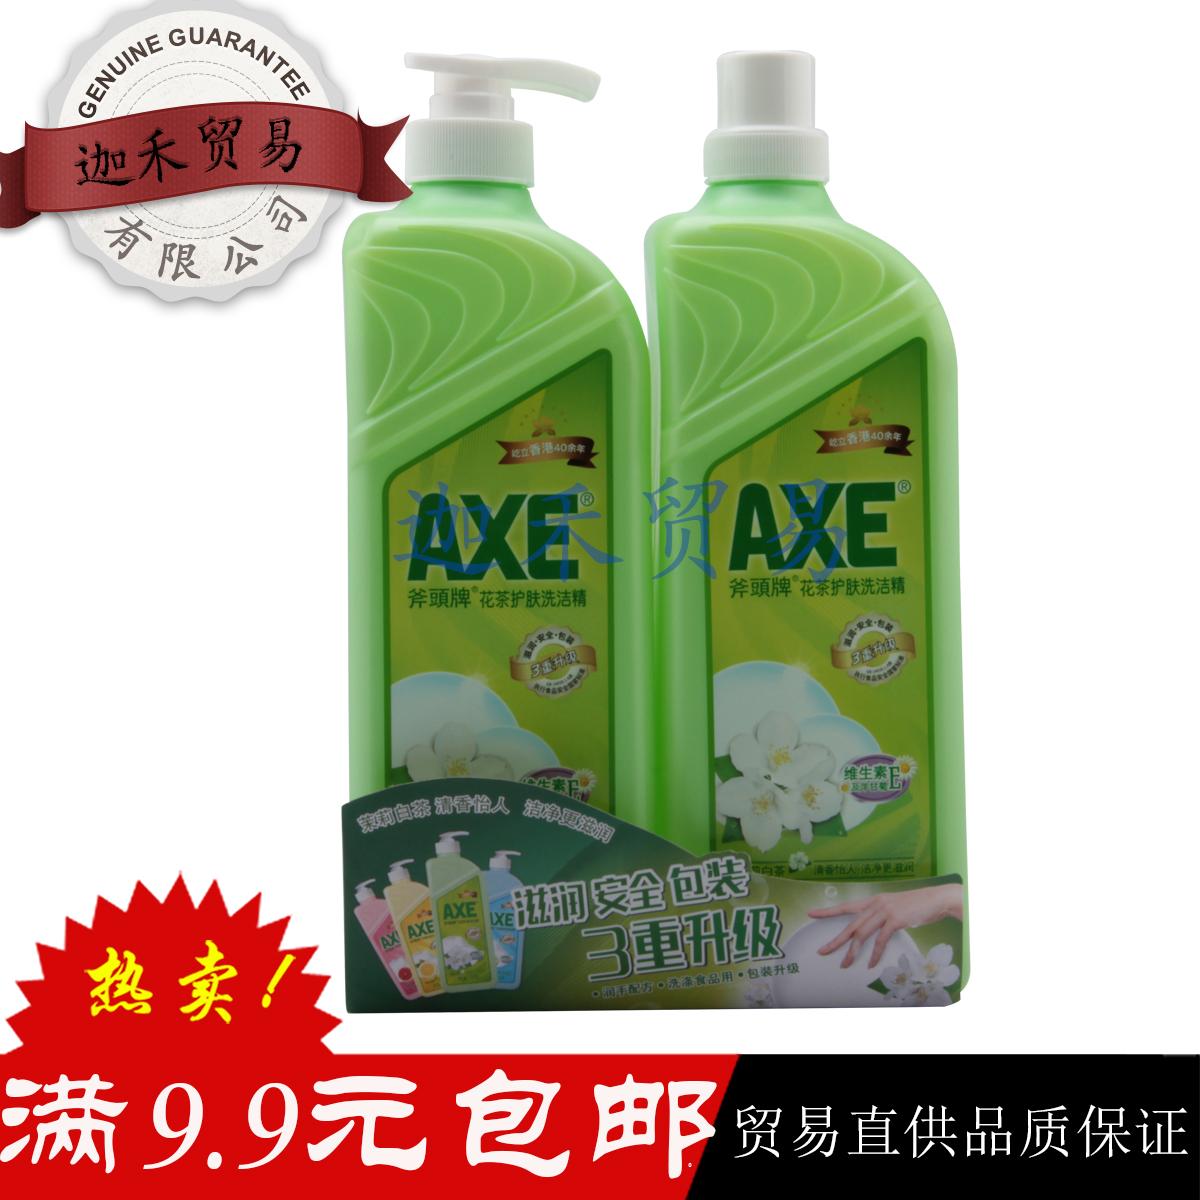 Axe Brand Flower Tea Hand Wash Detergent 1 18kg 2 Bottles Of Jasmine White